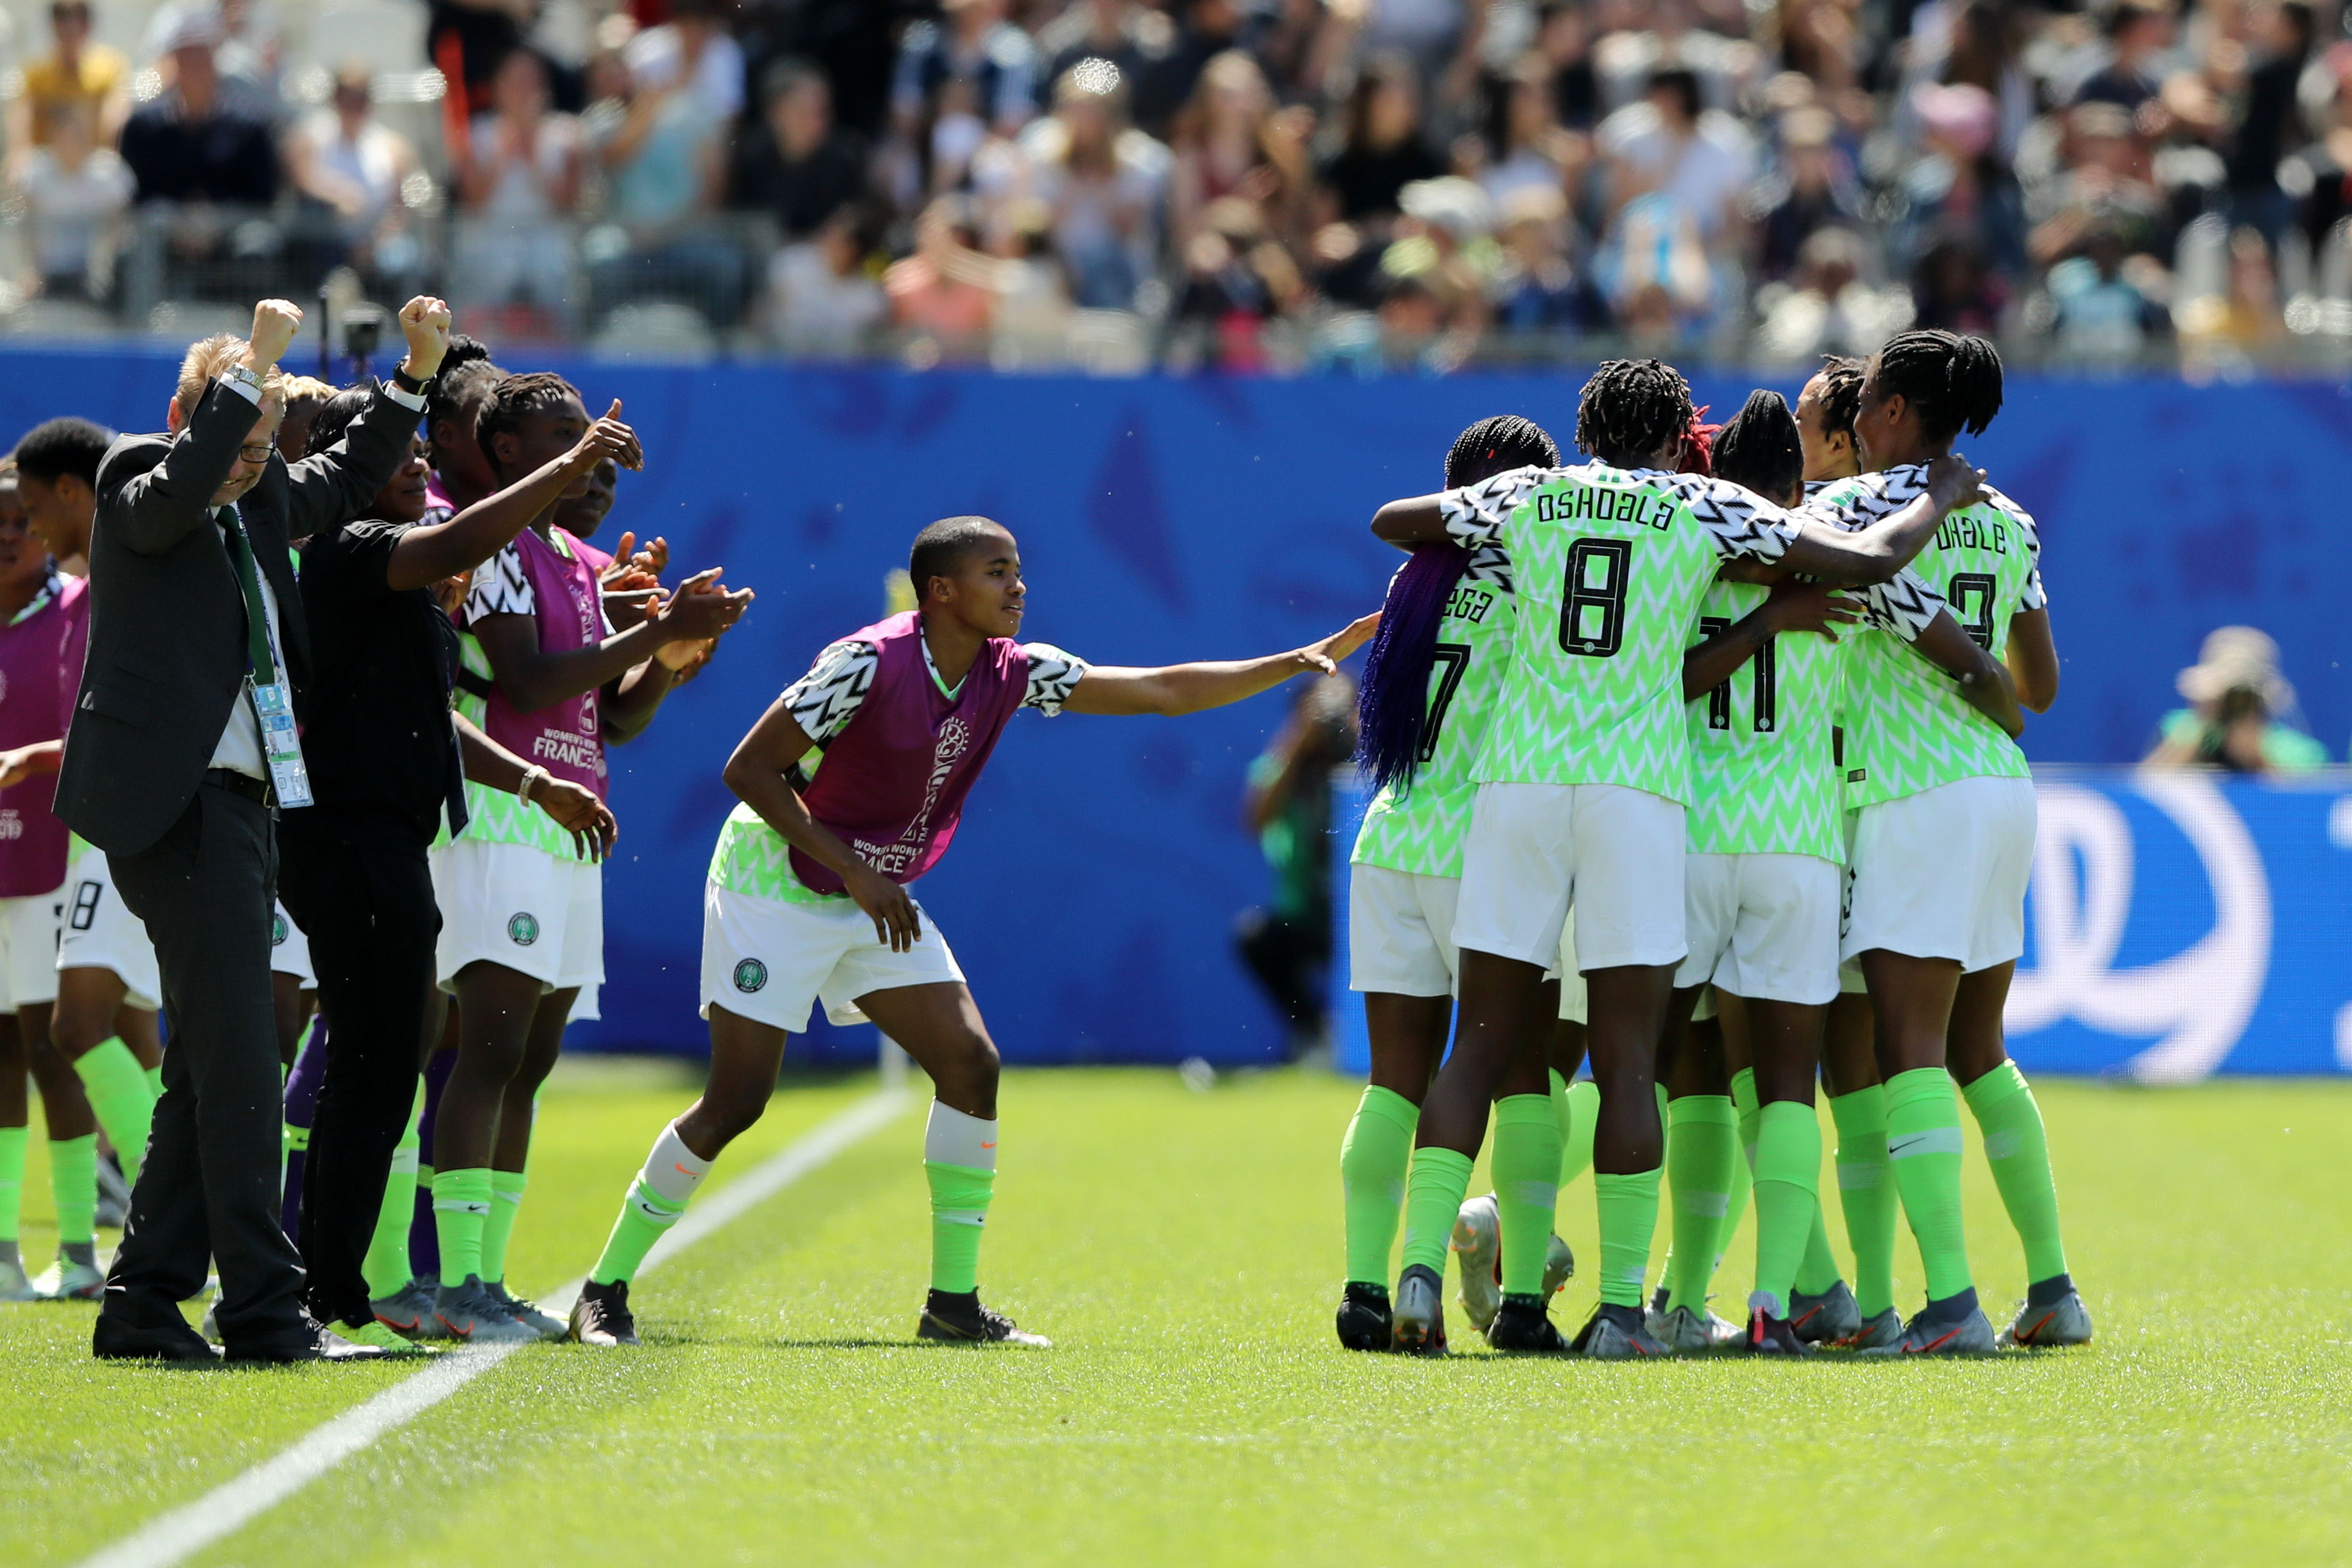 Les Nigerianes gagnent le match qu'il fallait (photo FIFA.com)